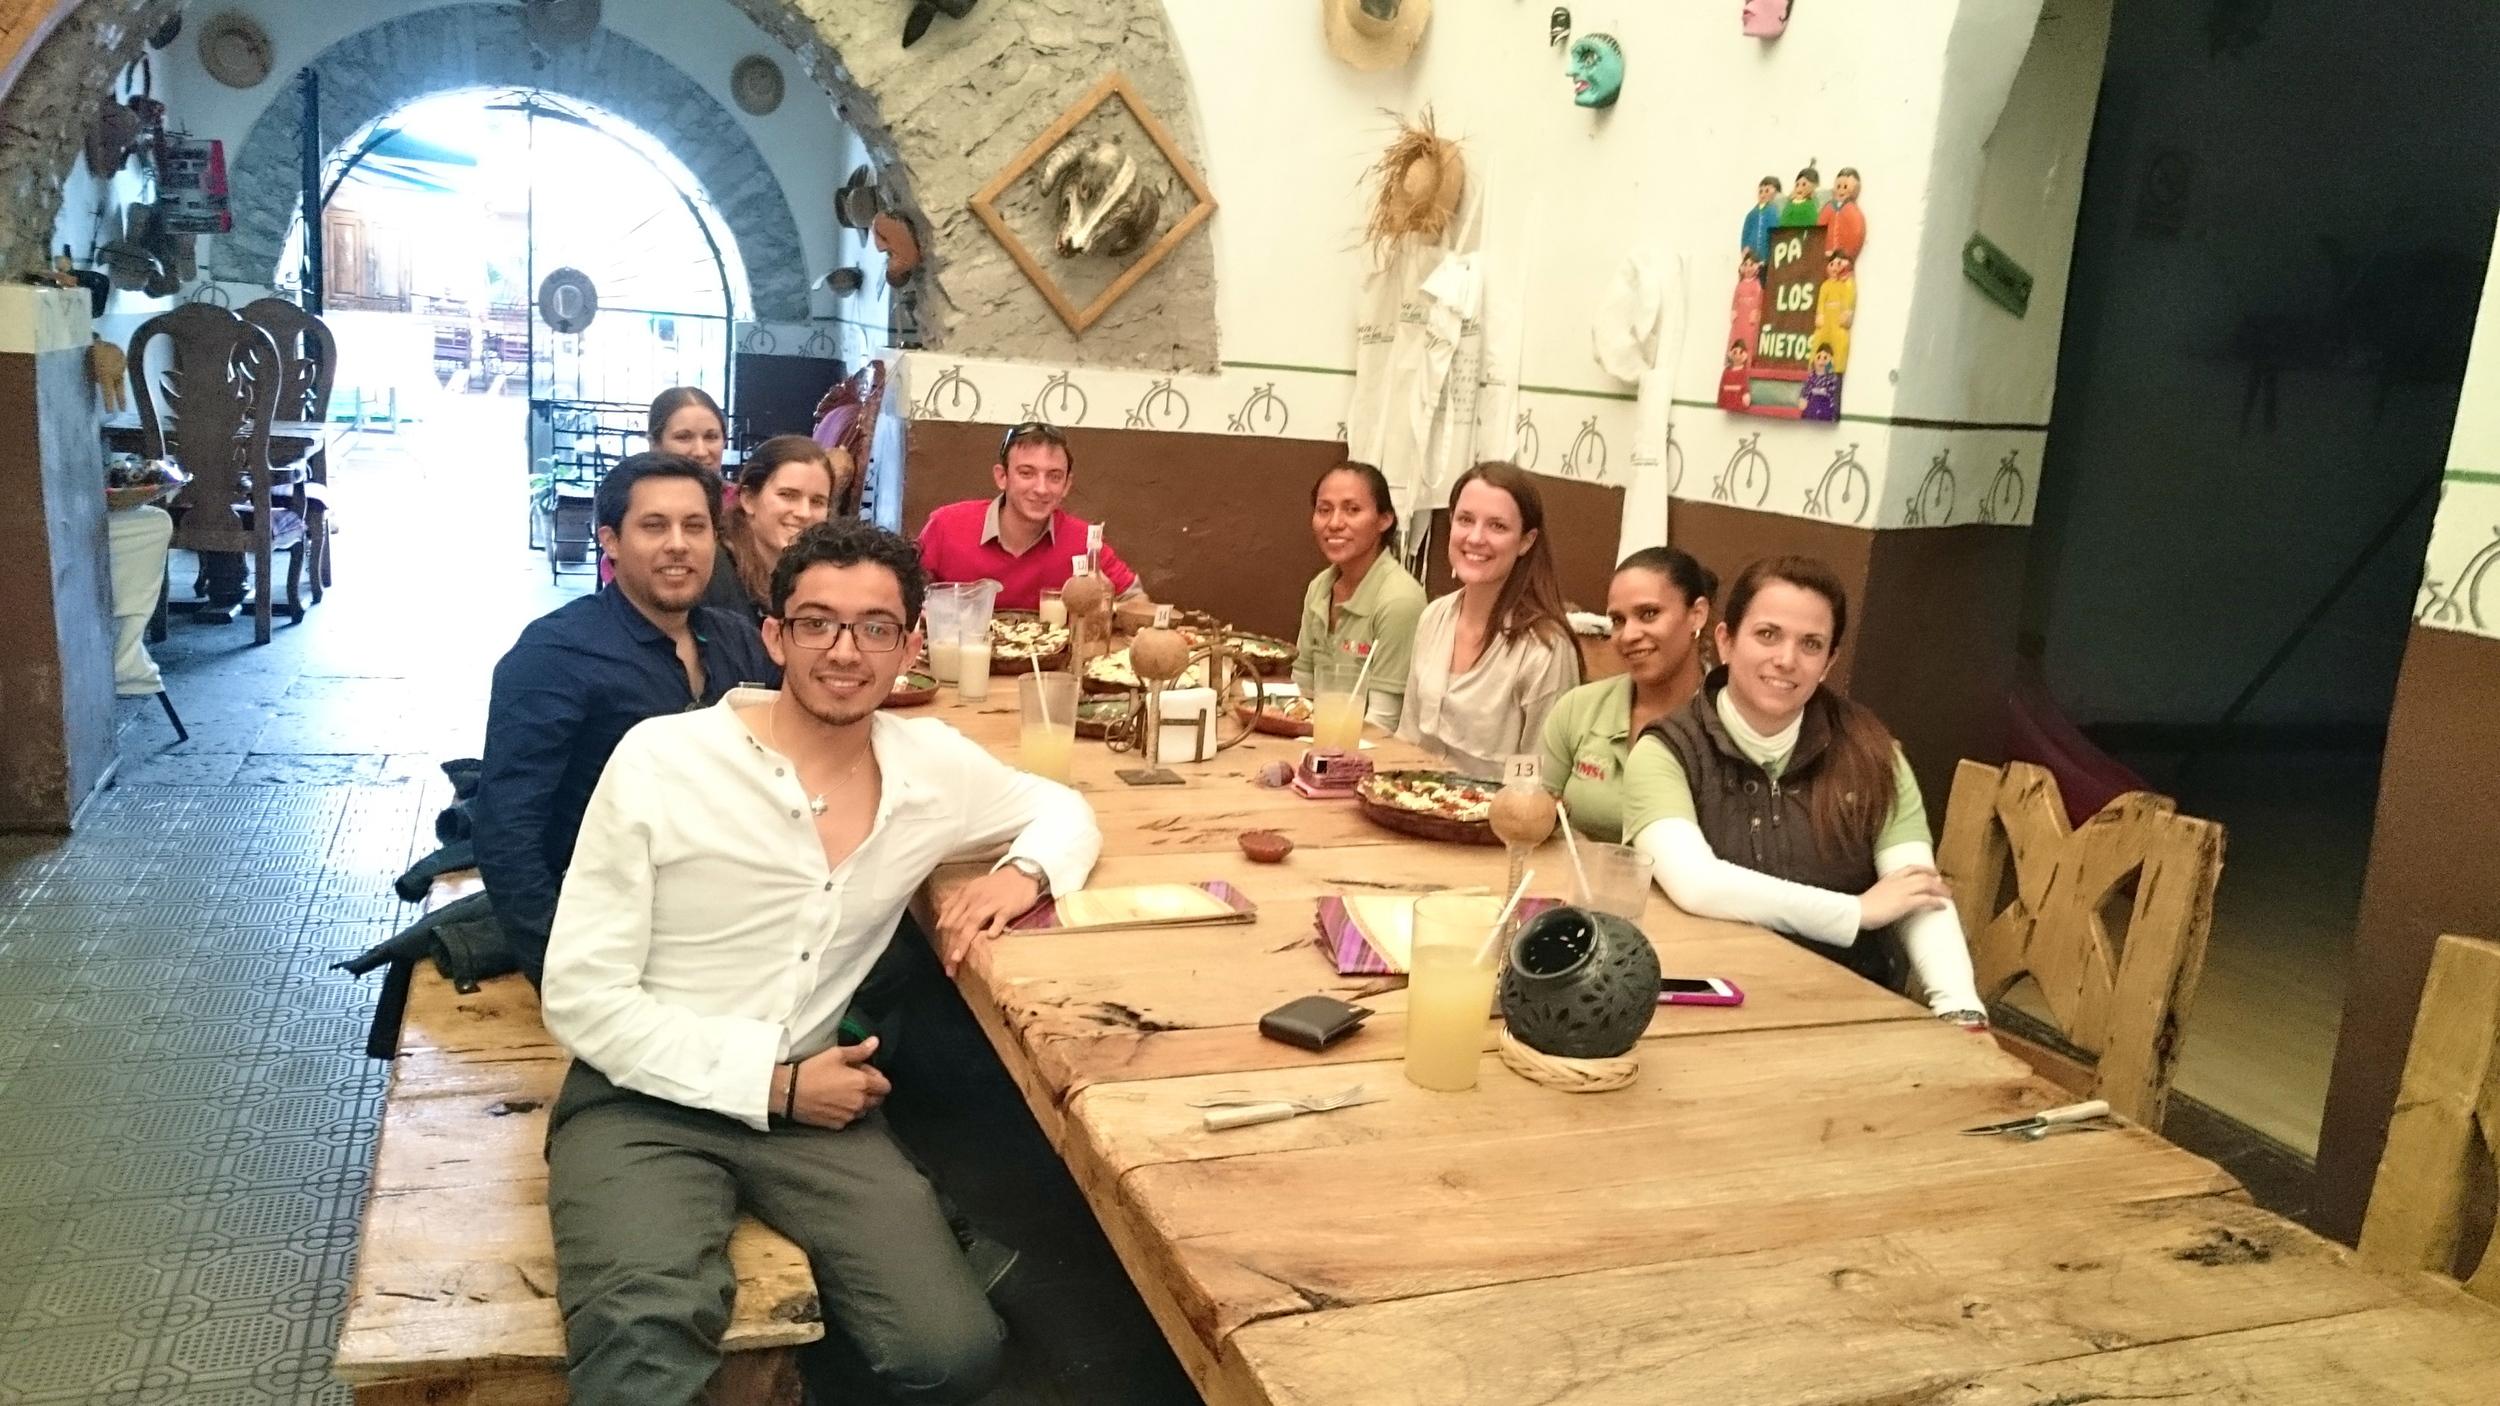 The FEMSA Foundation practicum team and our hosts in a restaurant in Queretaro, Mexico.